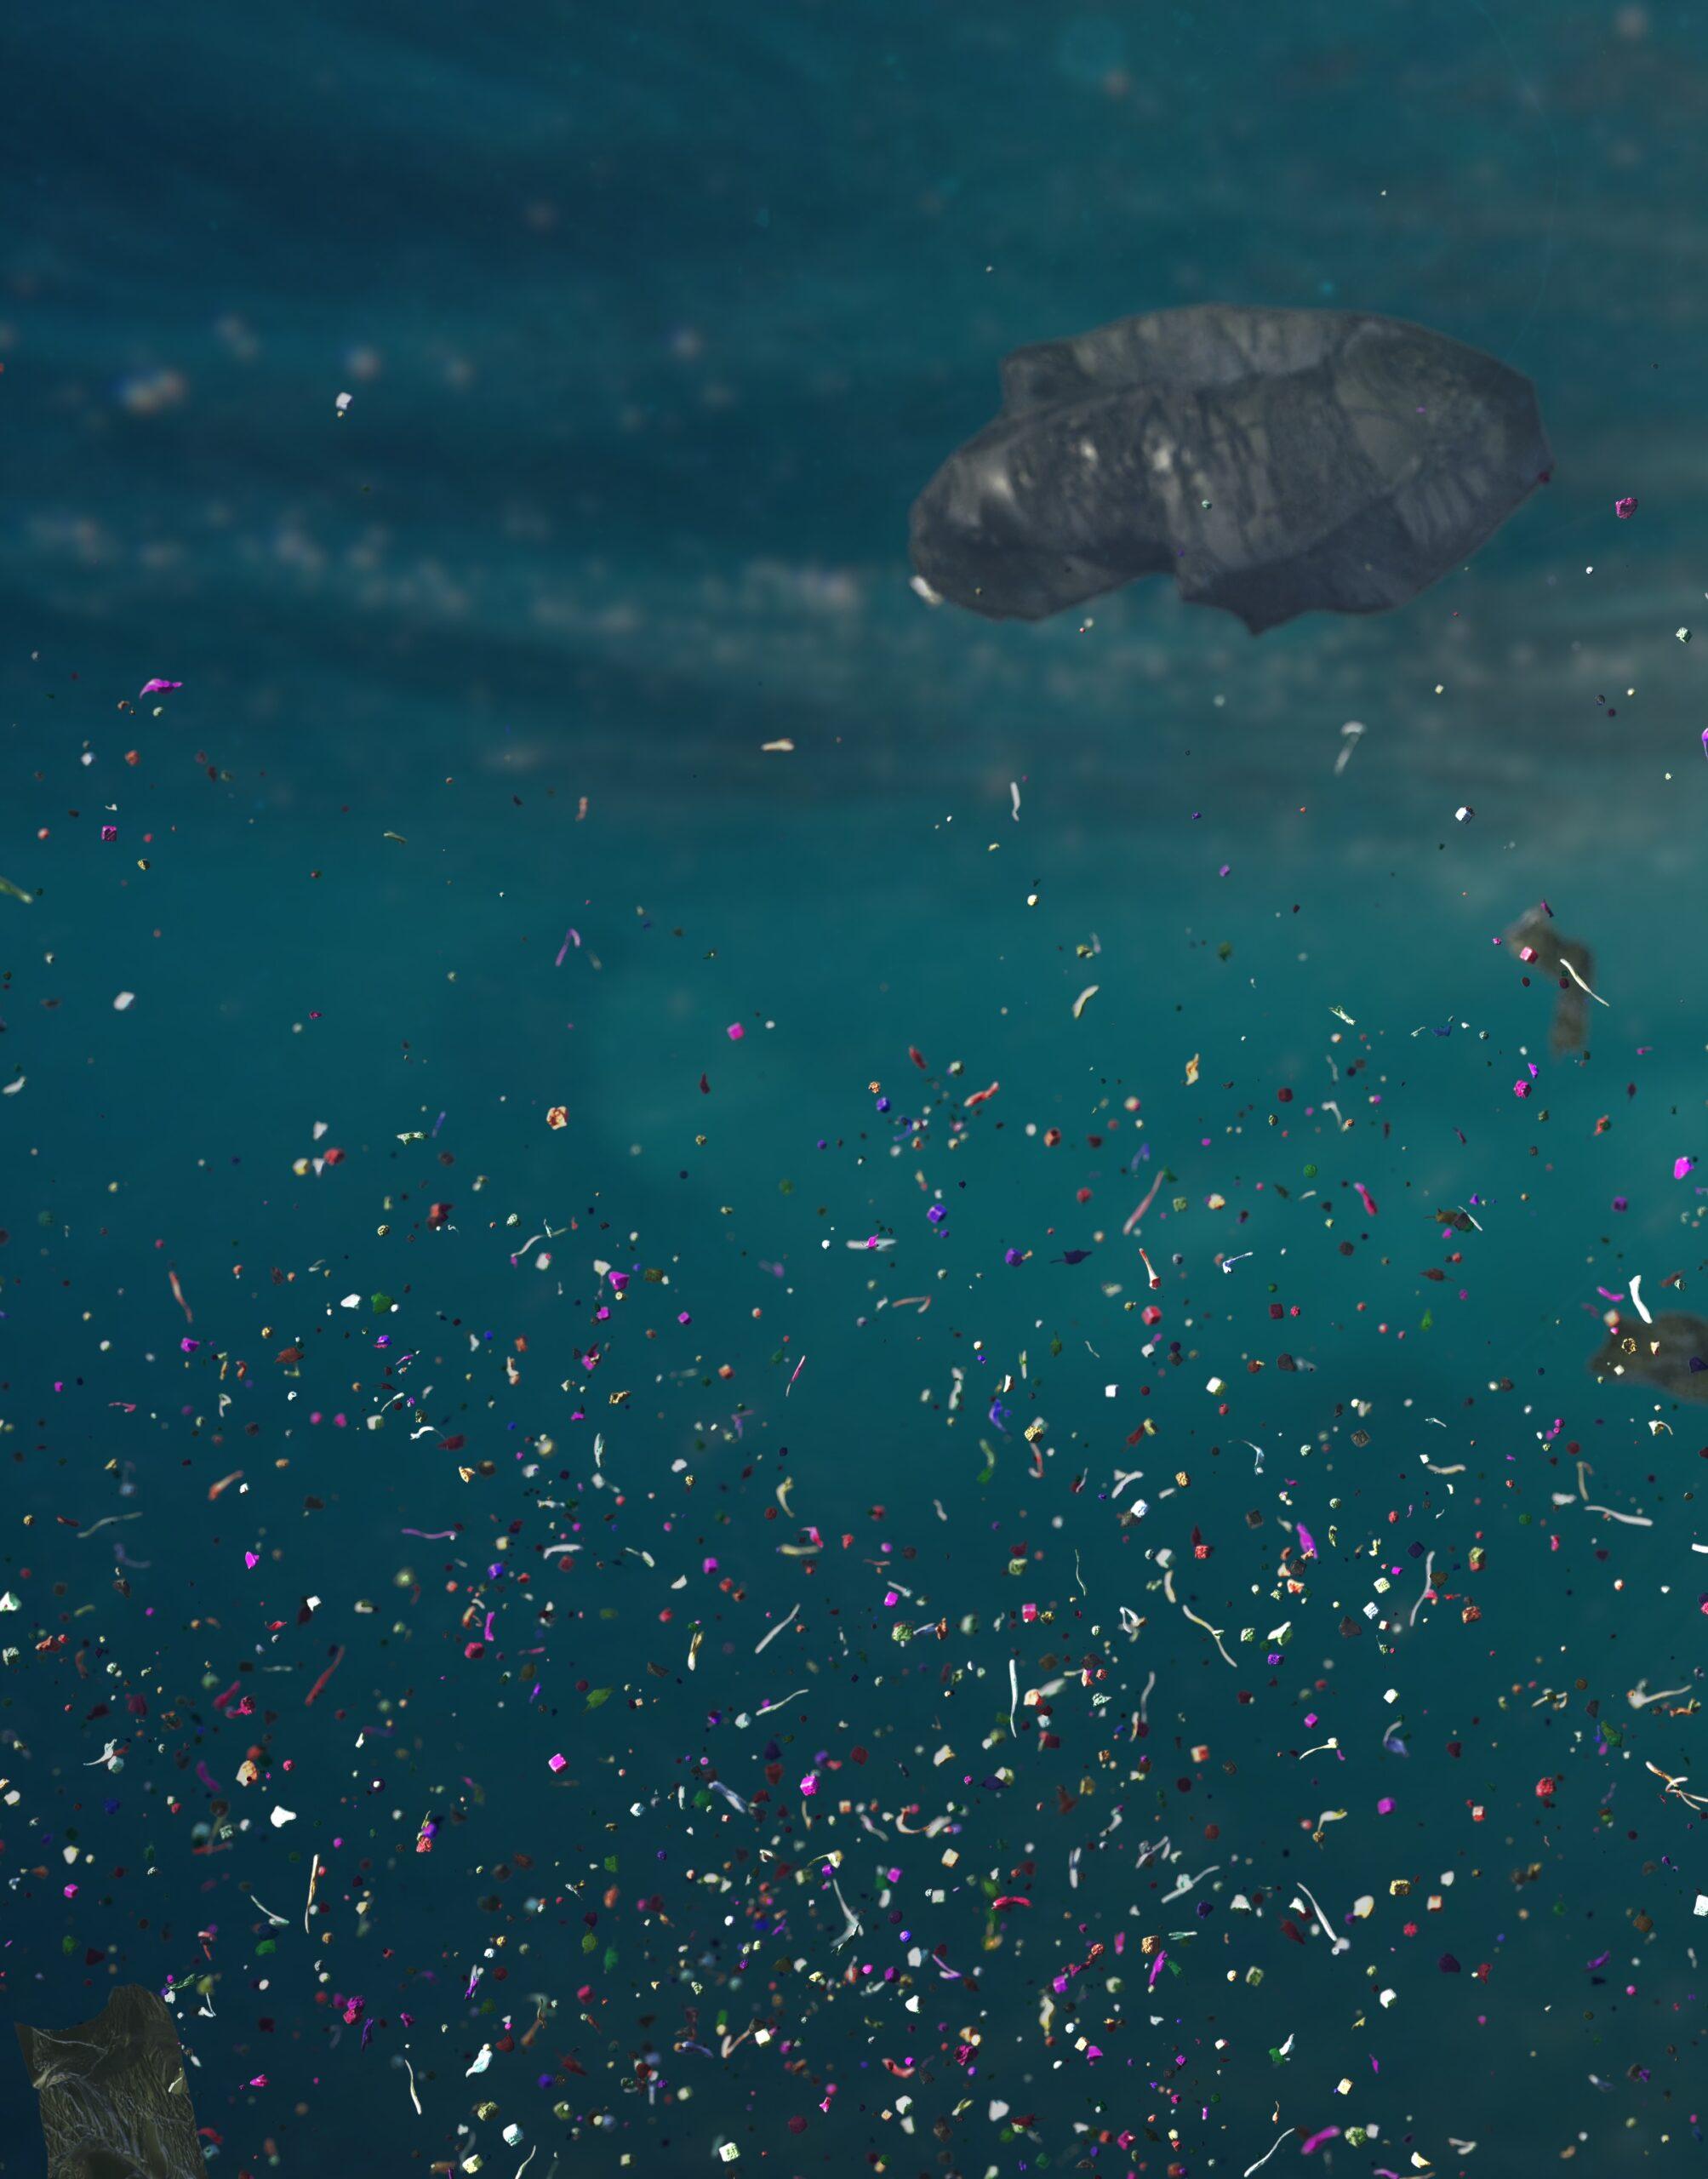 Contamination in the ocean